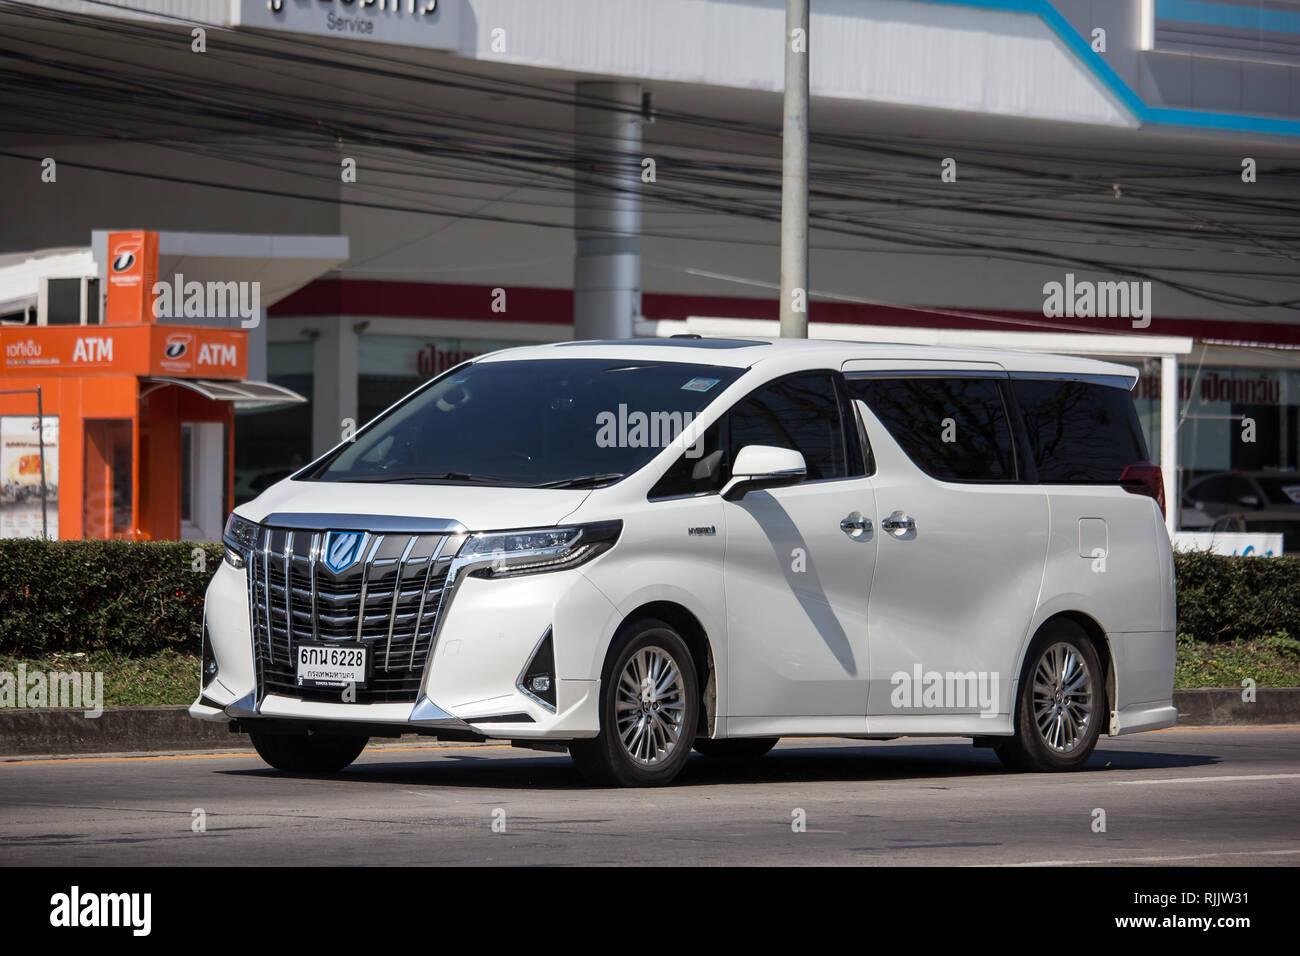 all new alphard 2019 harga yaris trd sportivo 2017 stock photos images alamy chiangmai thailand january 14 private toyota luxury van photo at